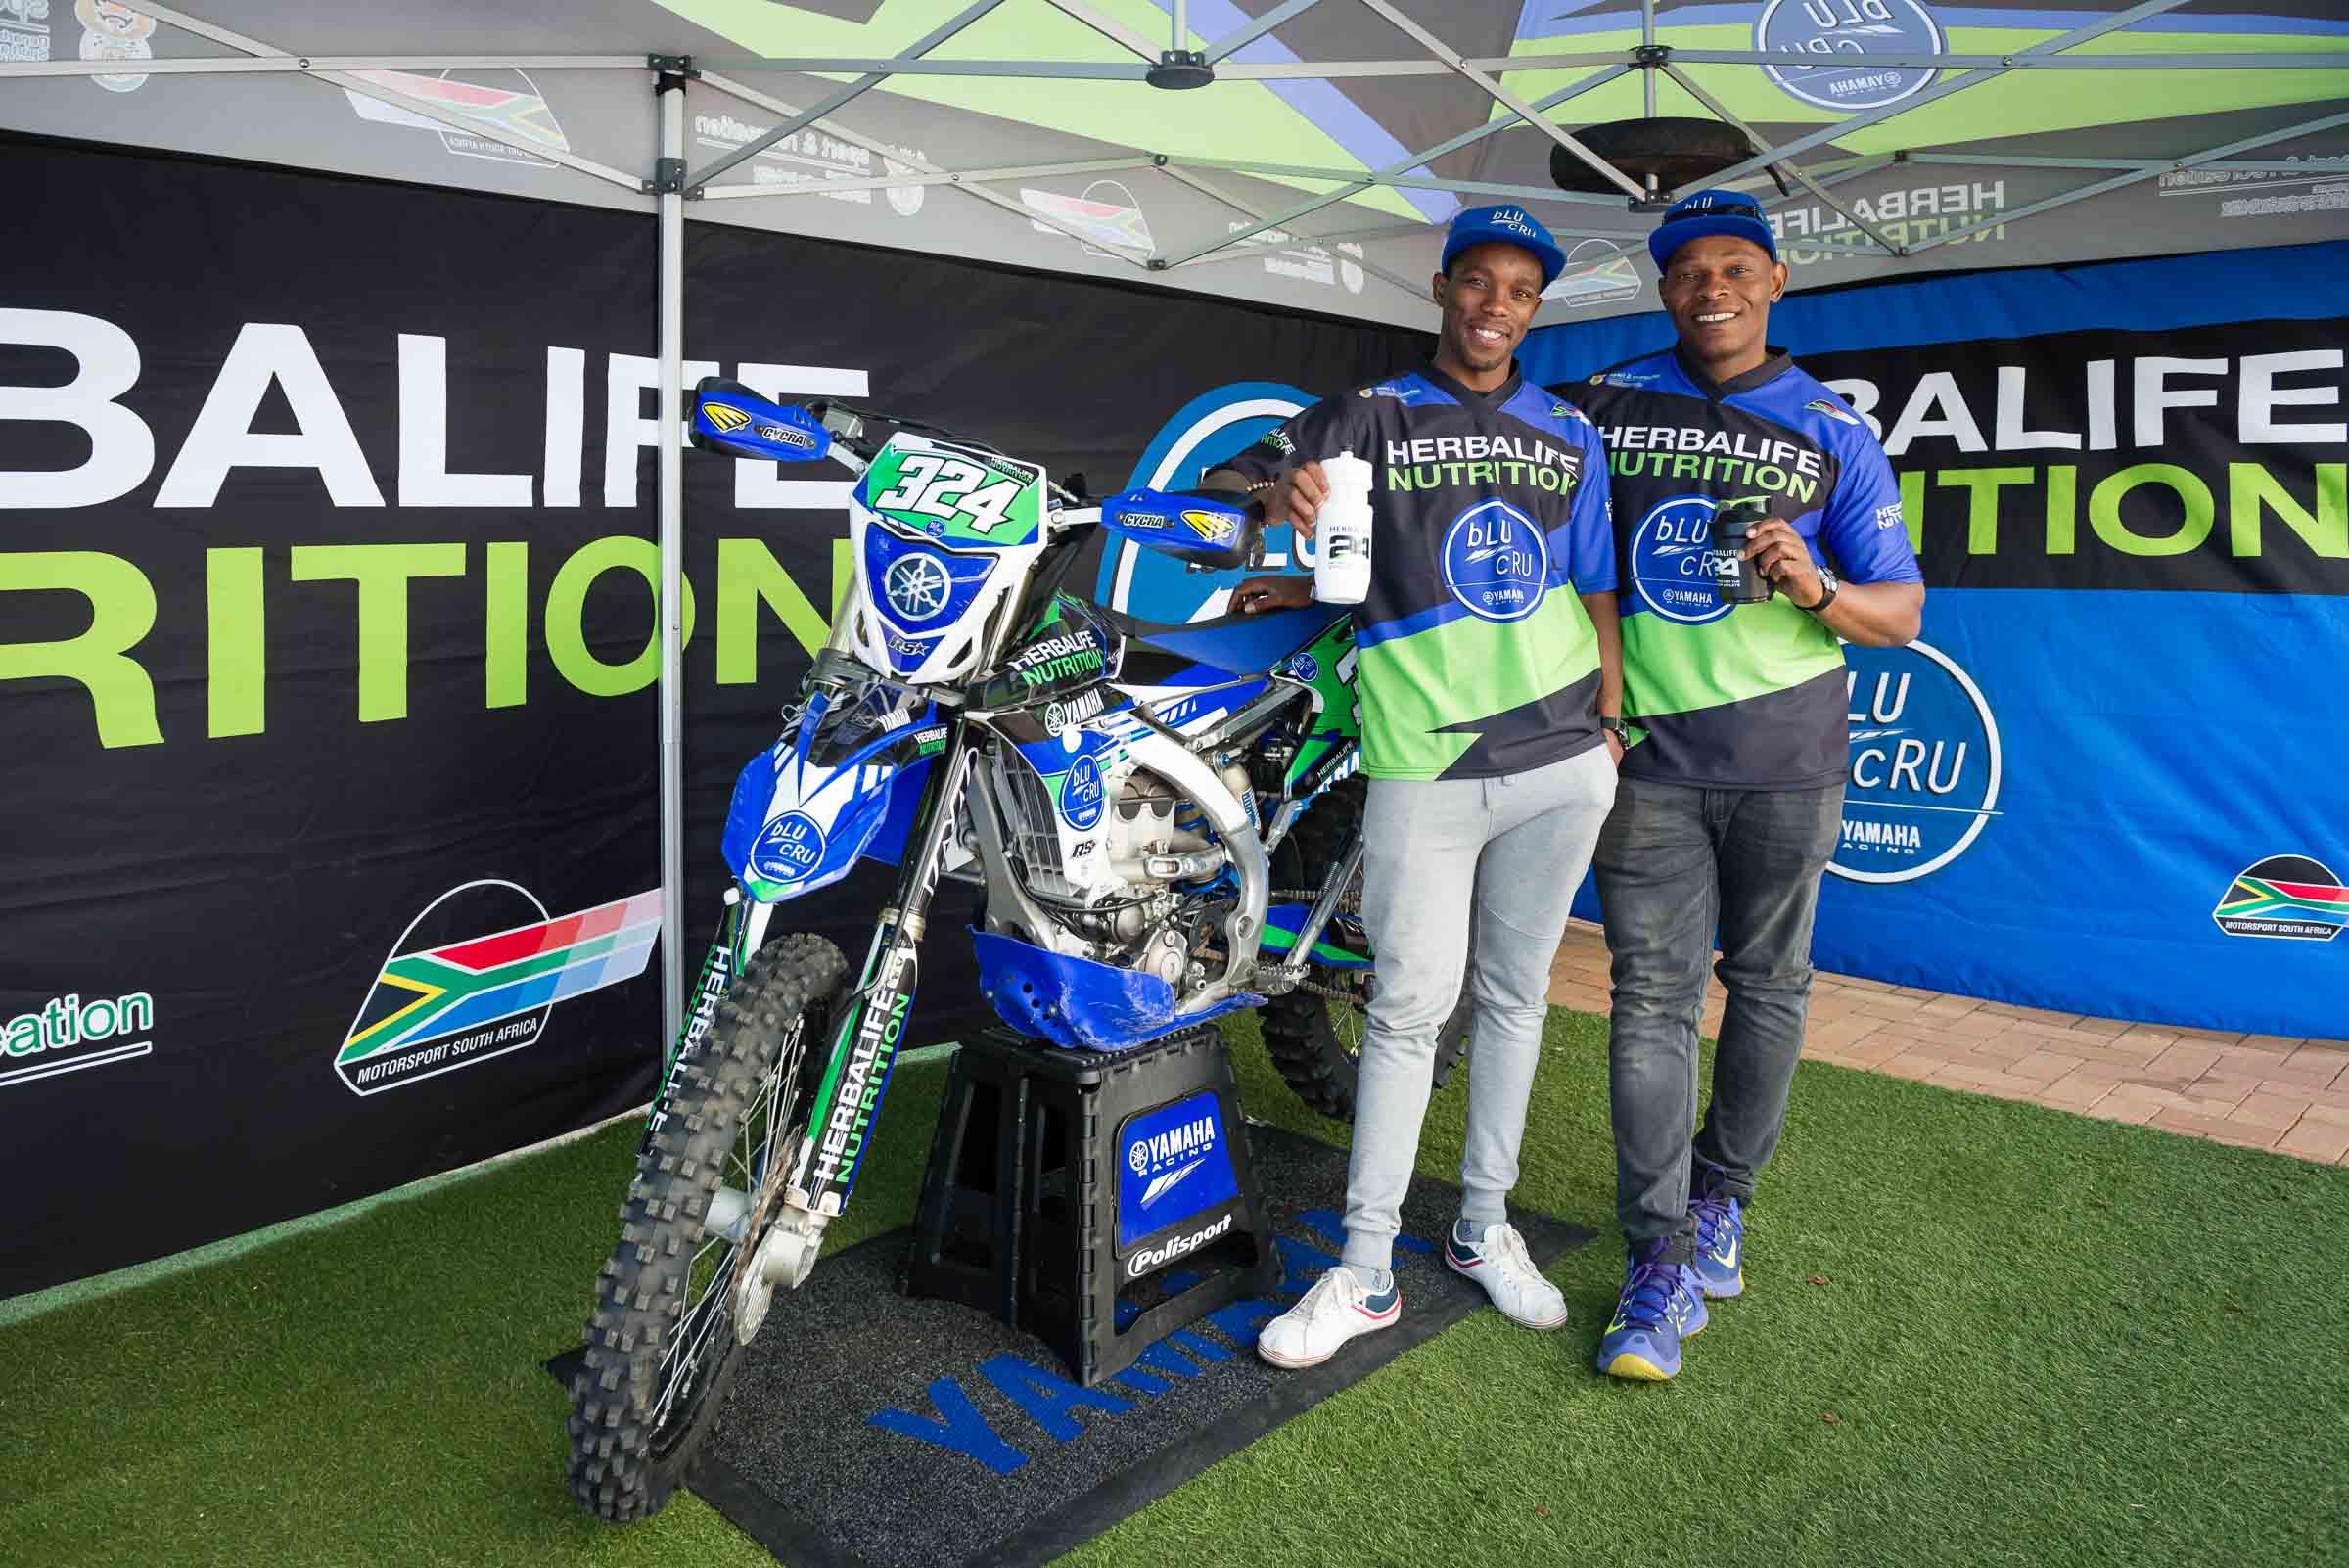 Thabang Katees & Piwe Zulu of the Herbalife Nutrition bLU cRU Yamaha Team_edit